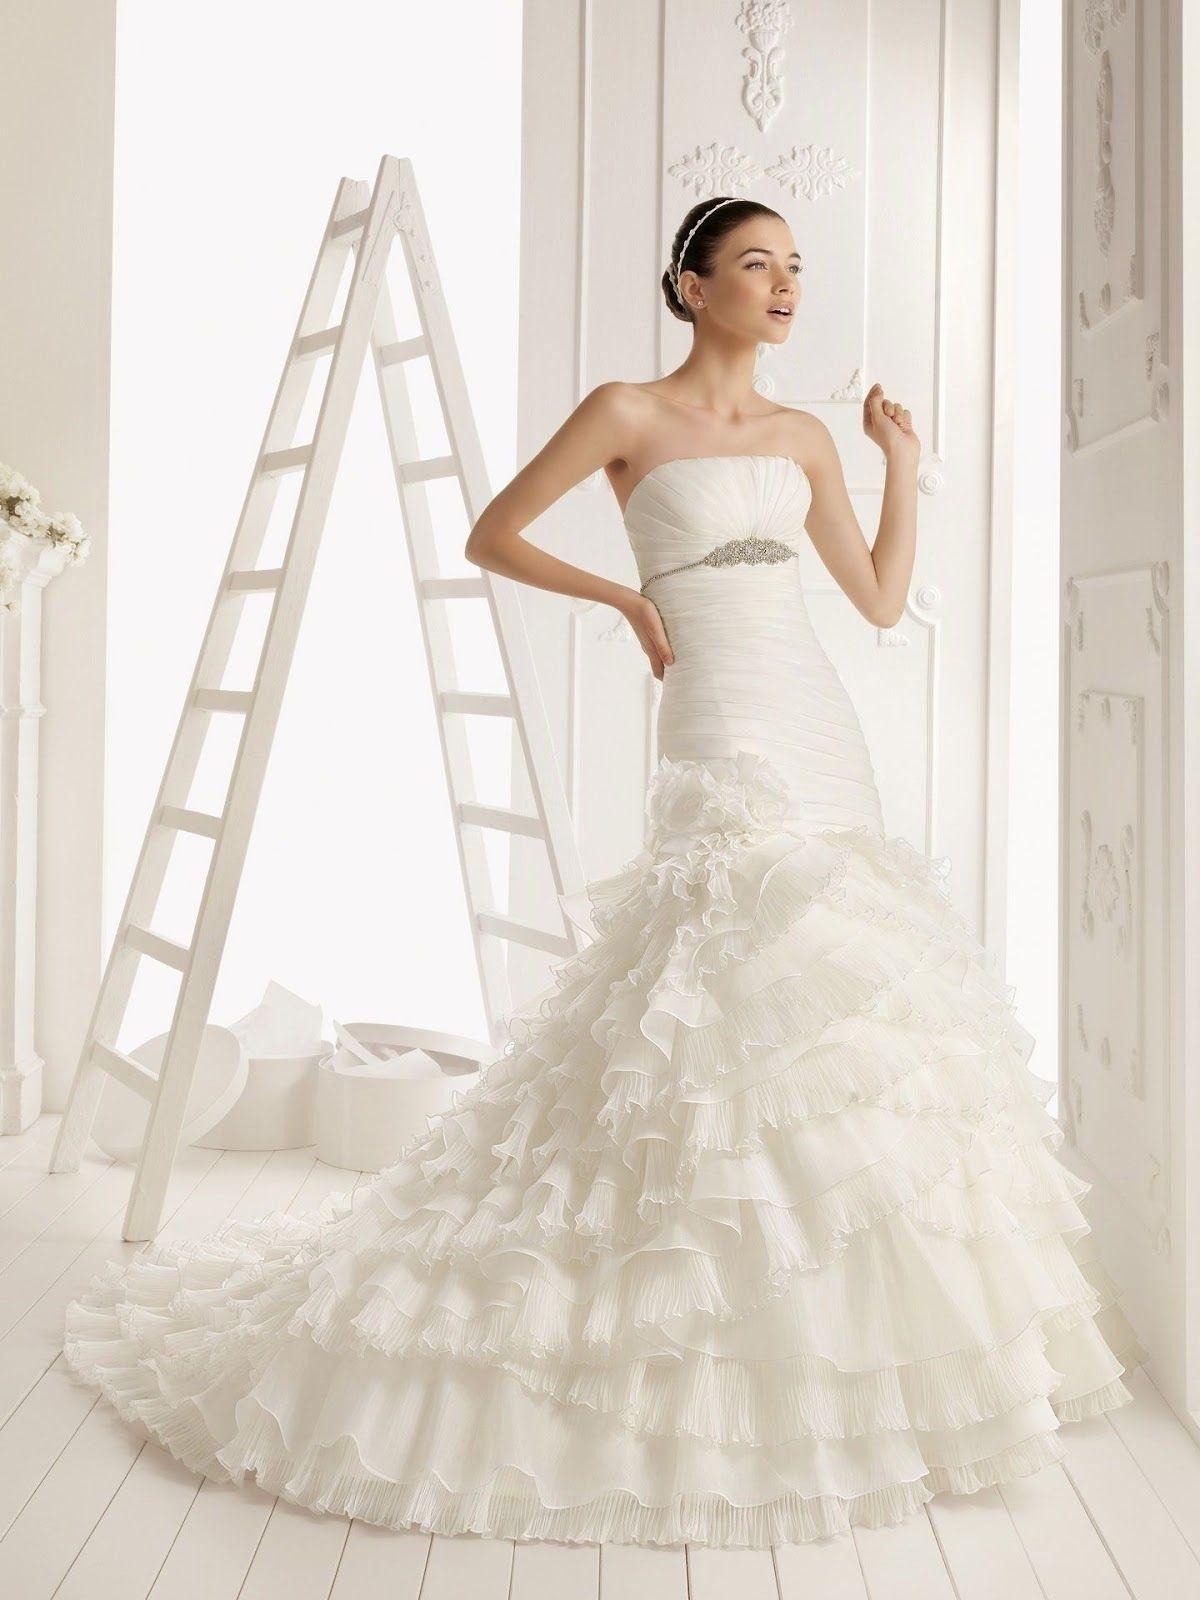 Wedding Dresses Pittsburgh | Wedding Dress | Pinterest | Wedding ...